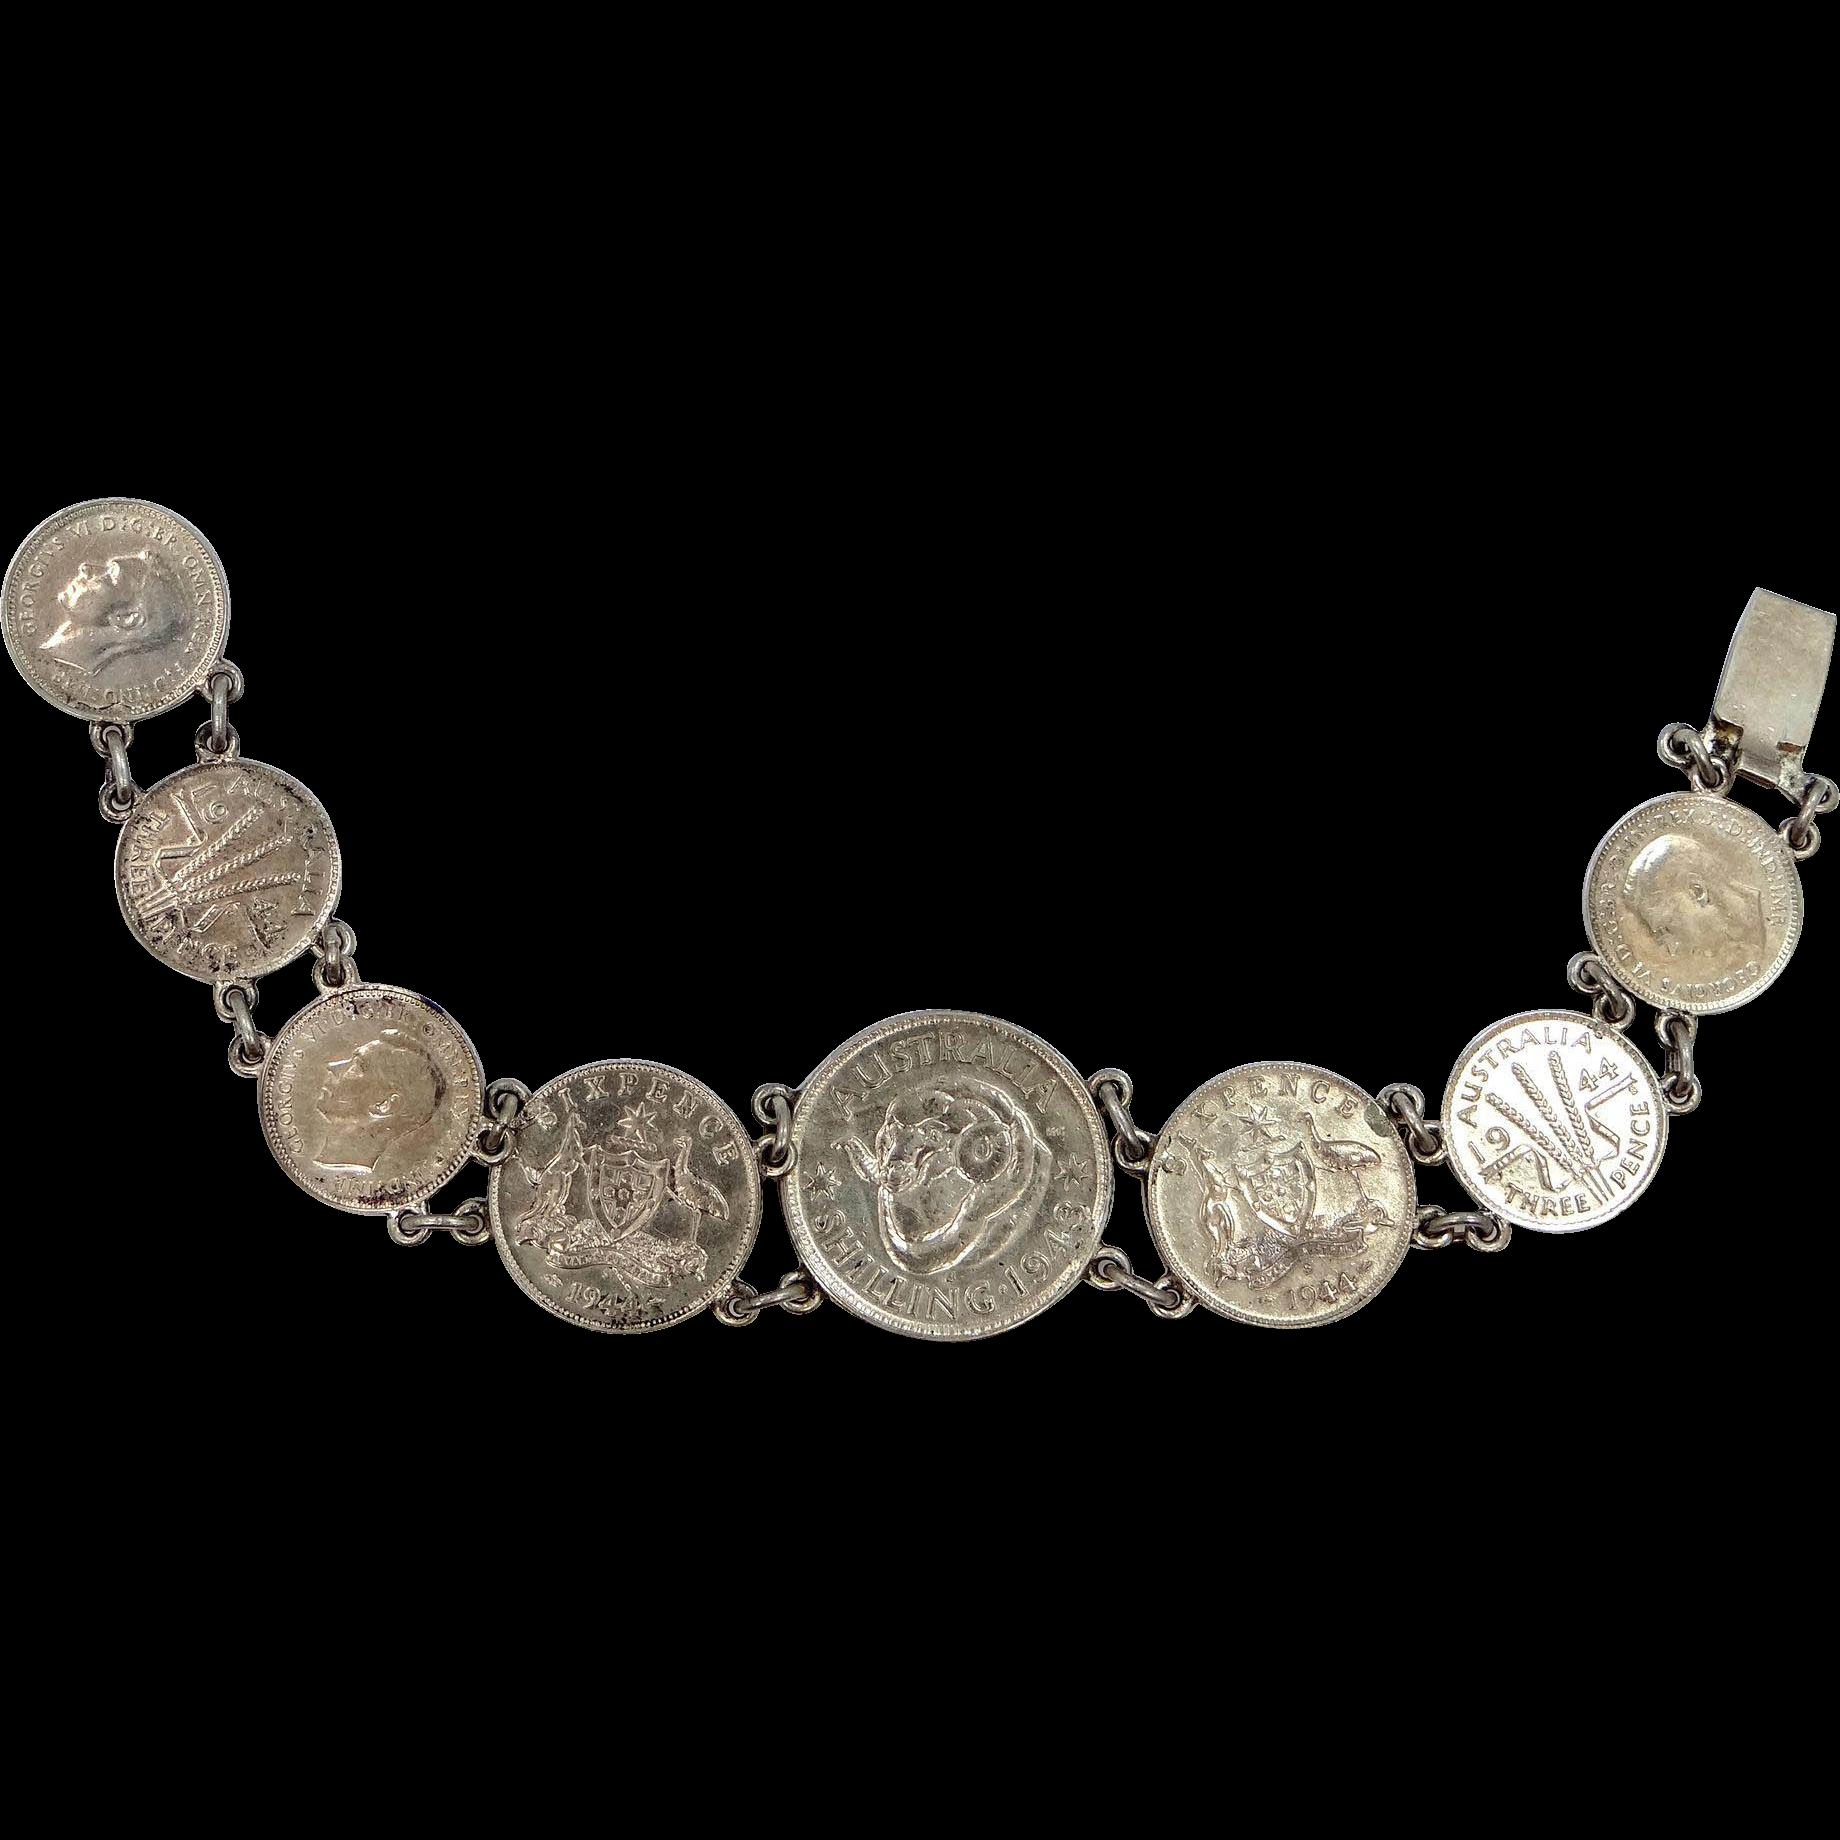 1940s Sterling Silver Australian Coin Bracelet